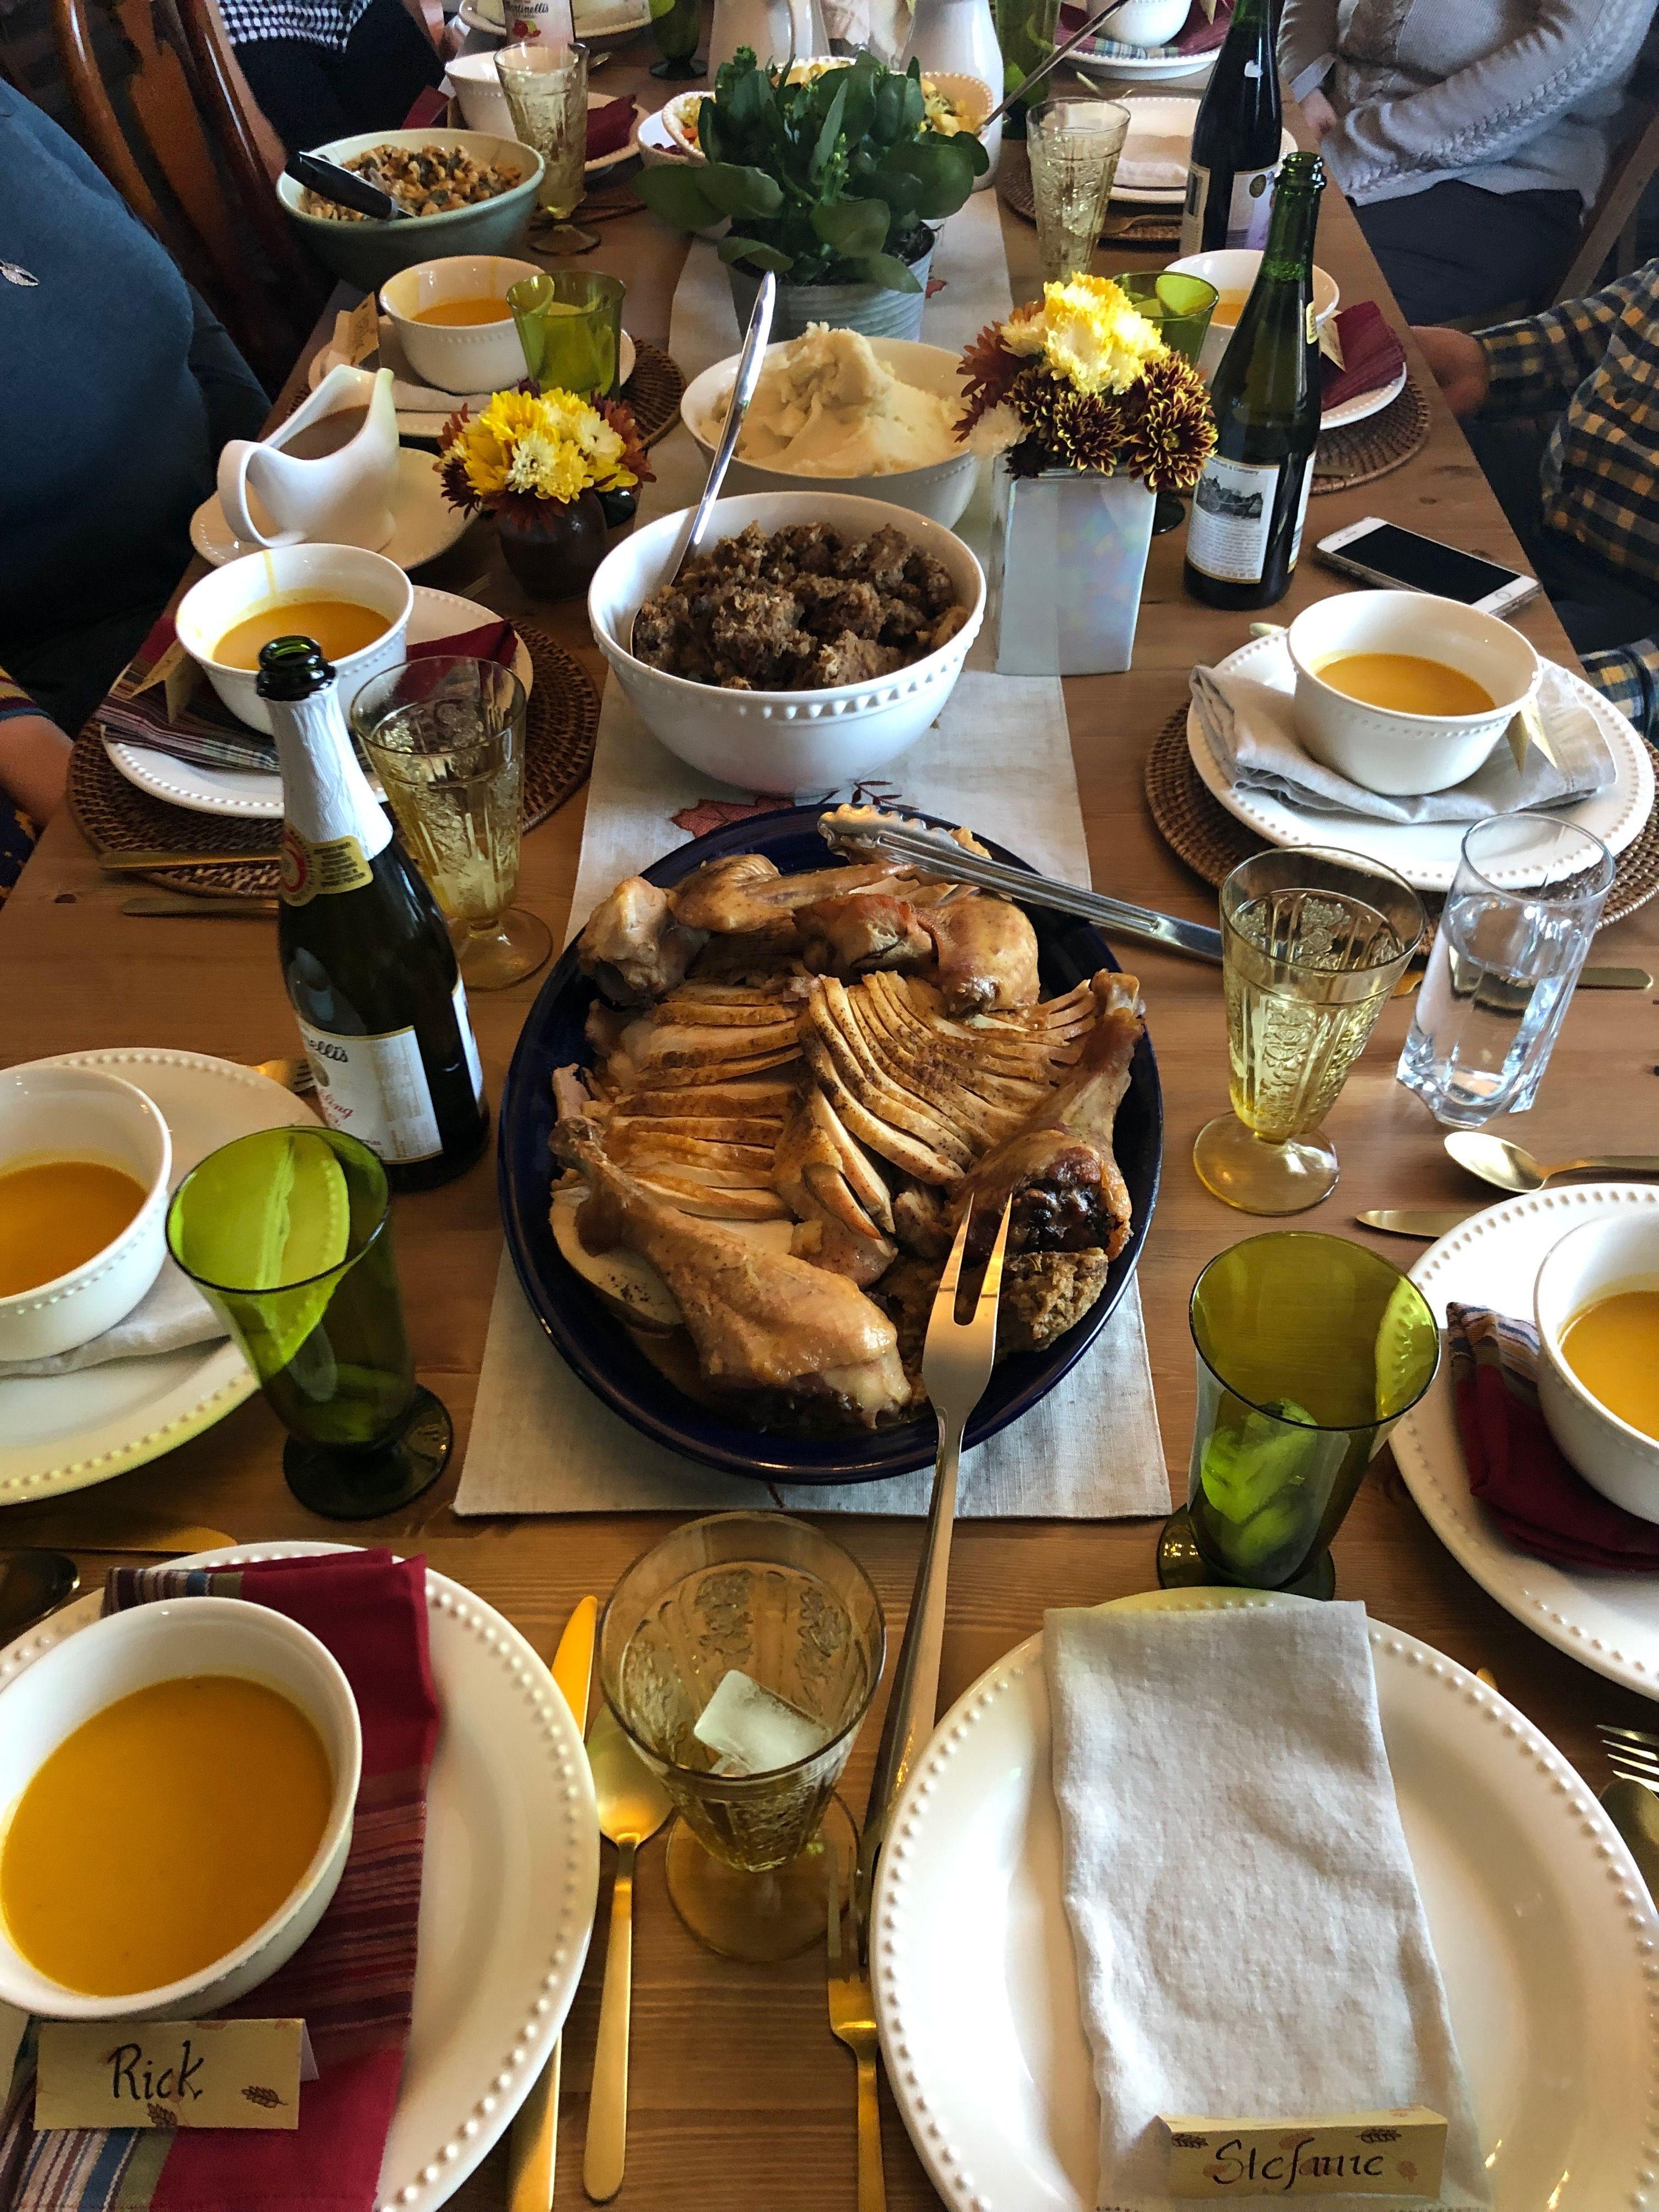 Thanksgiving Dinner In 2020 Thanksgiving Catering Turkey Dinner Thanksgiving Dinner